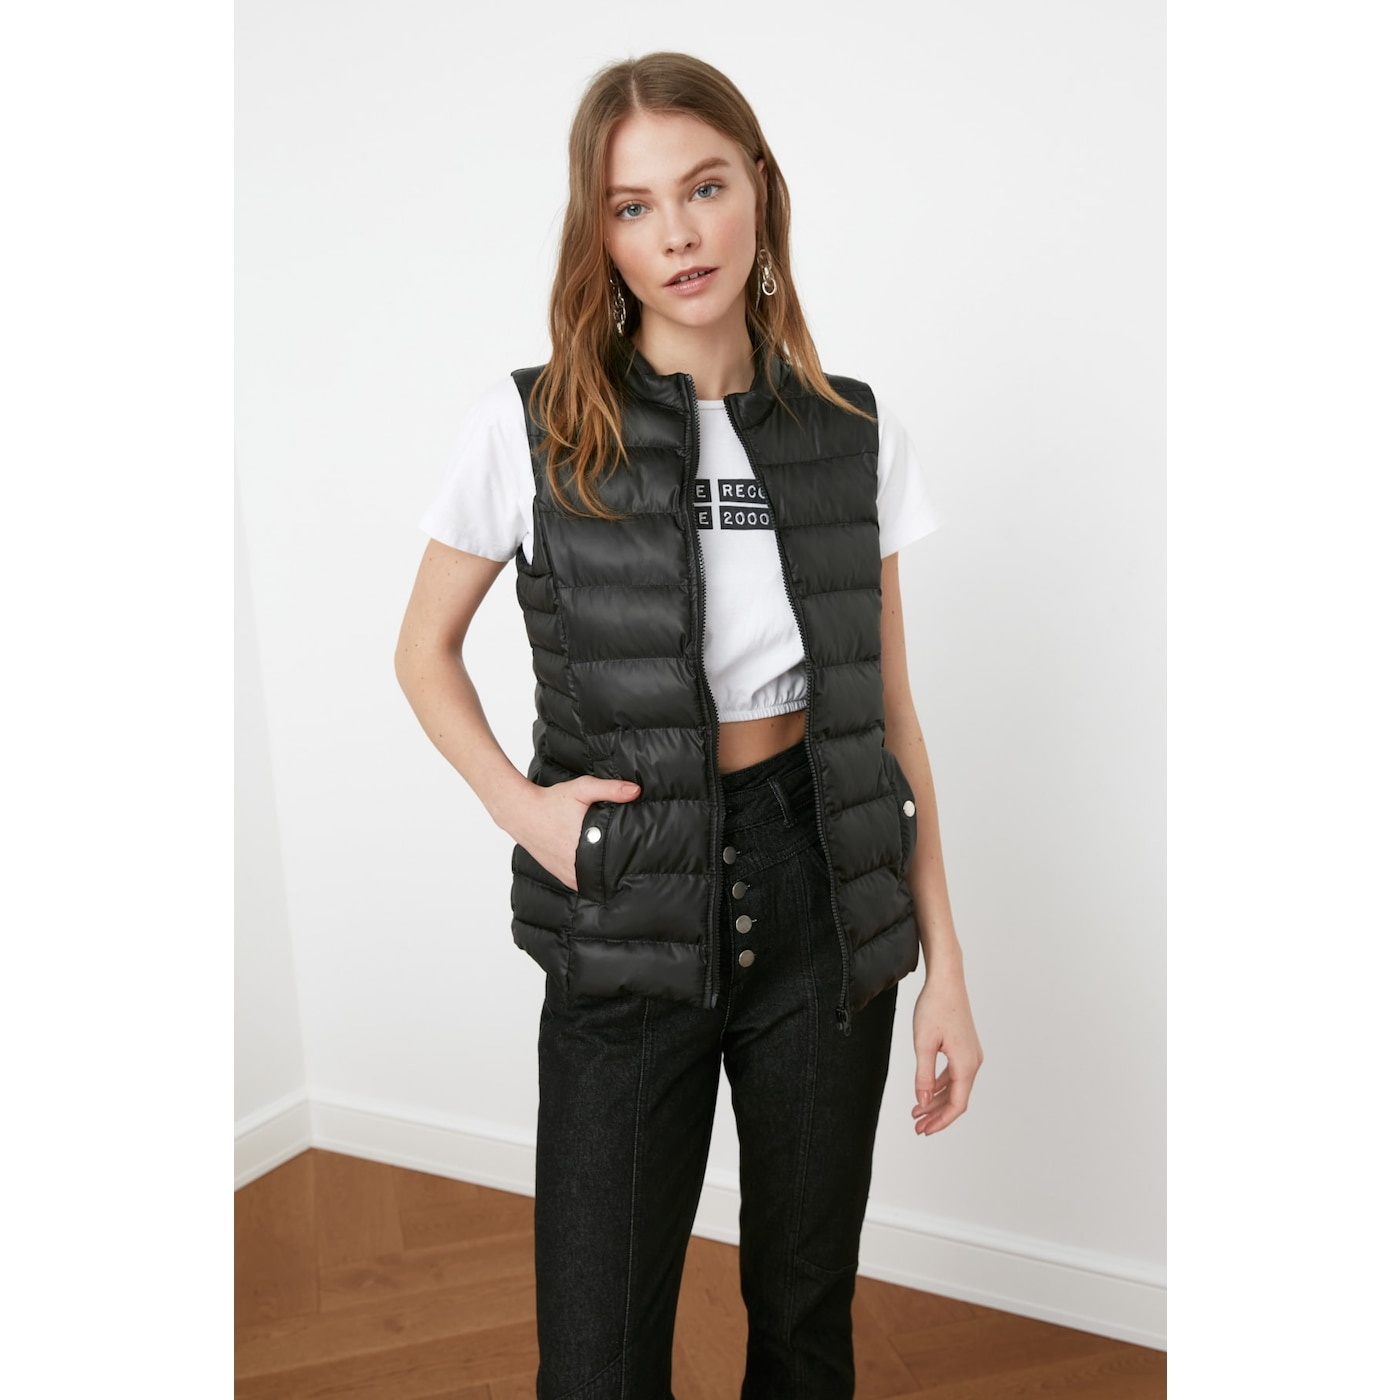 Trendyol Black Right Collar Inflatable Vest dámské S